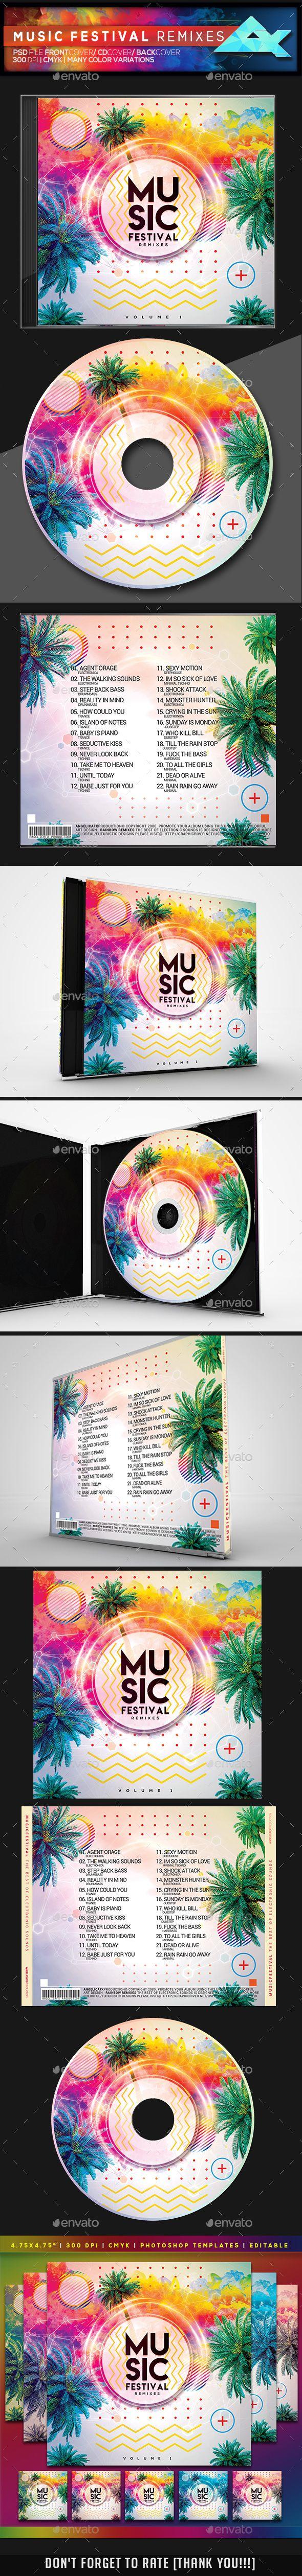 super music festival cd dvd photoshop template psd cd dvd cover